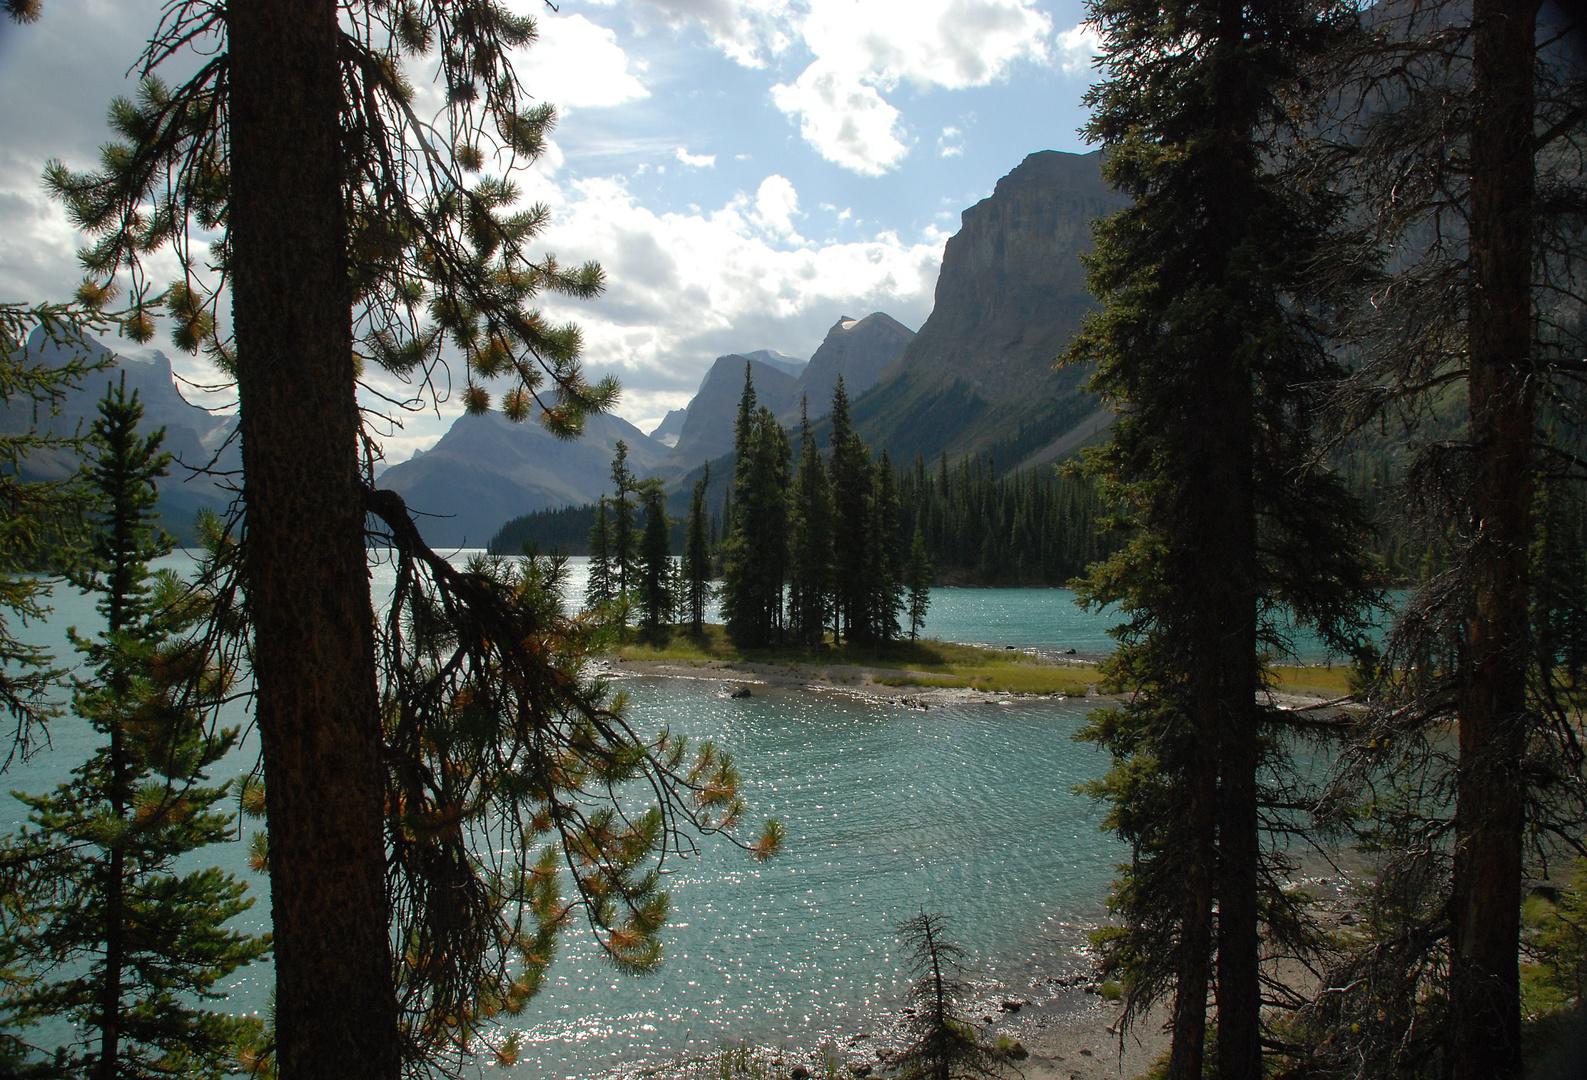 Spirit Island, Maligne Lake, Canada 2009